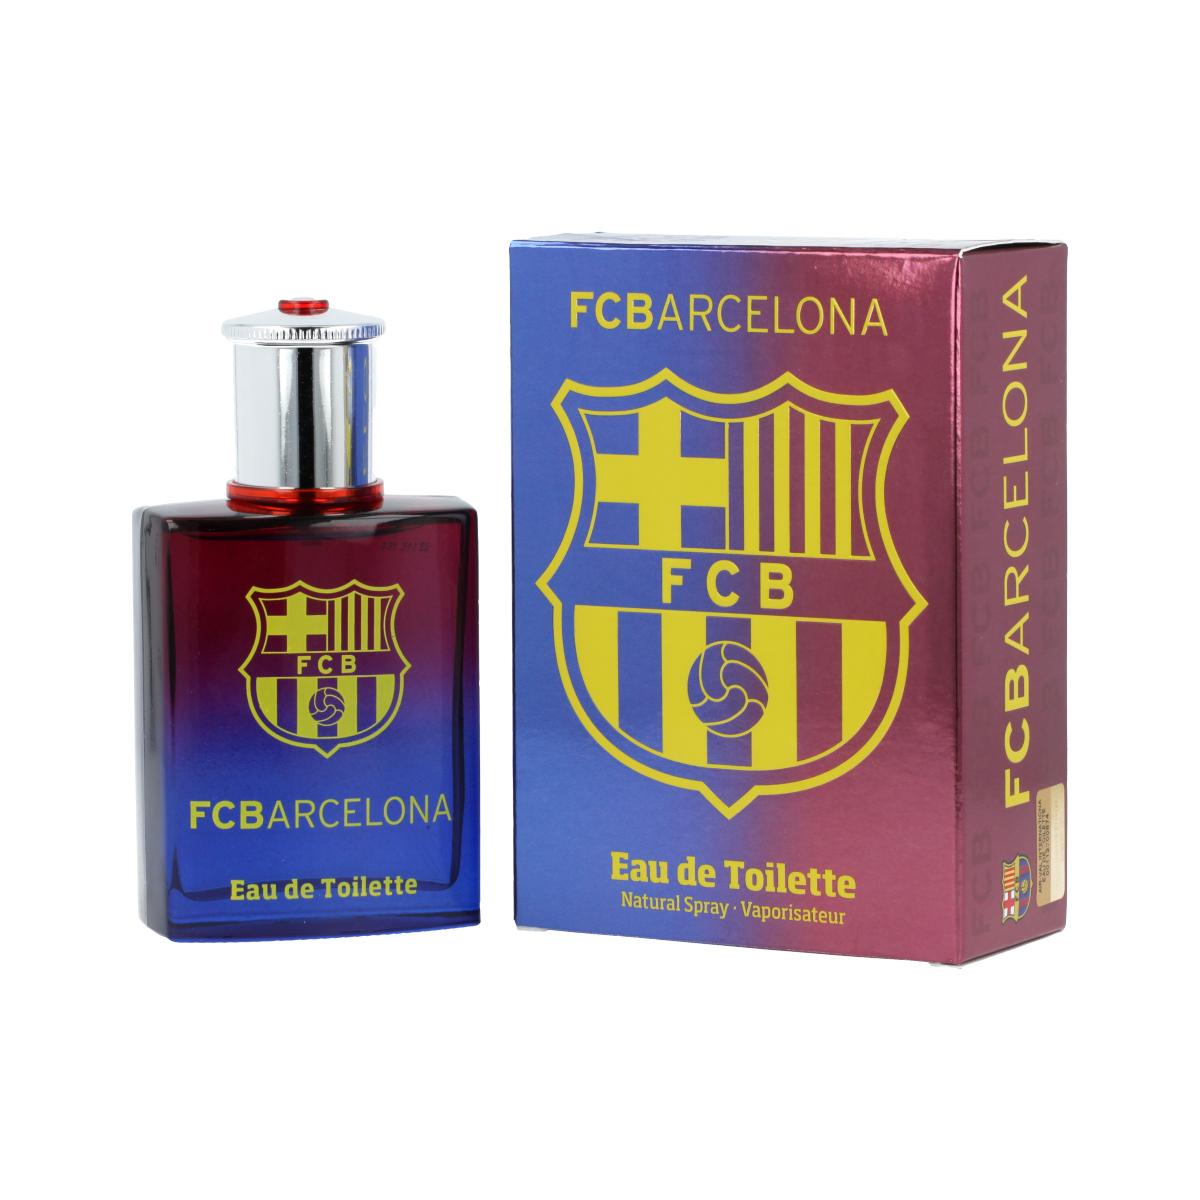 FC Barcelona FC Barcelona Eau De Toilette 100 ml (man) 72654